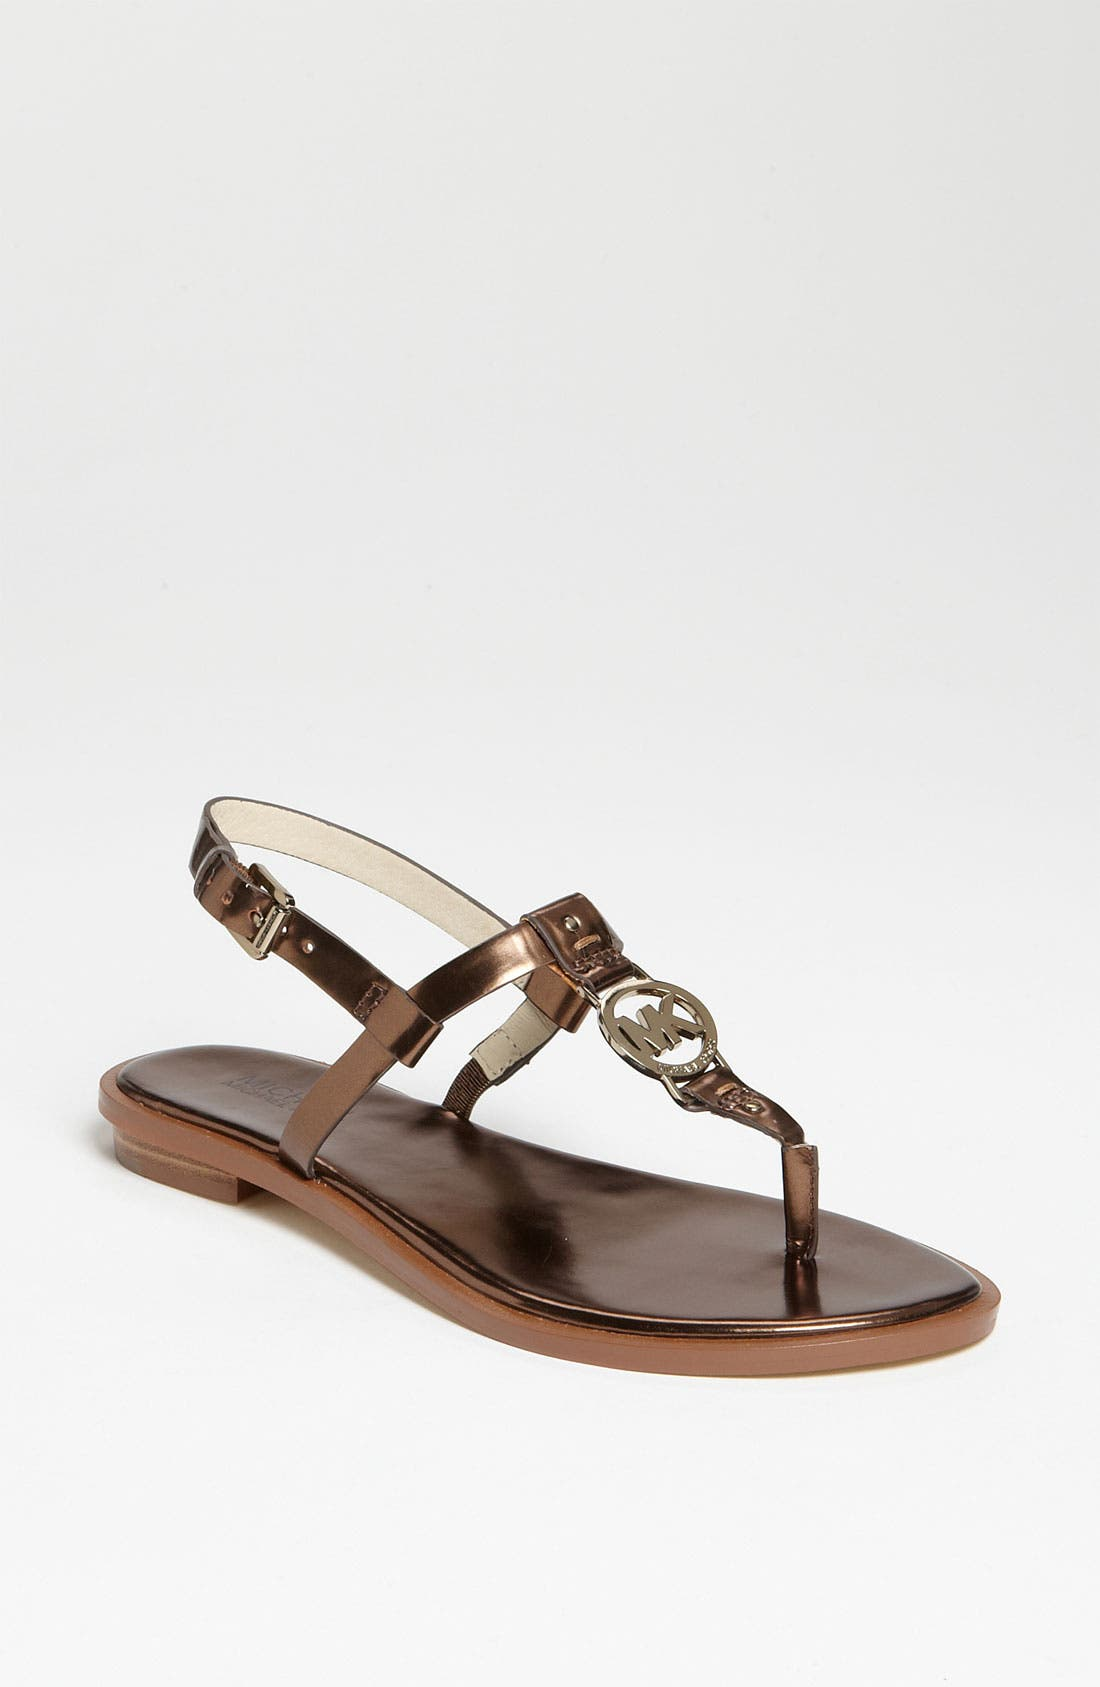 Main Image - MICHAEL Michael Kors 'Sondra' Sandal